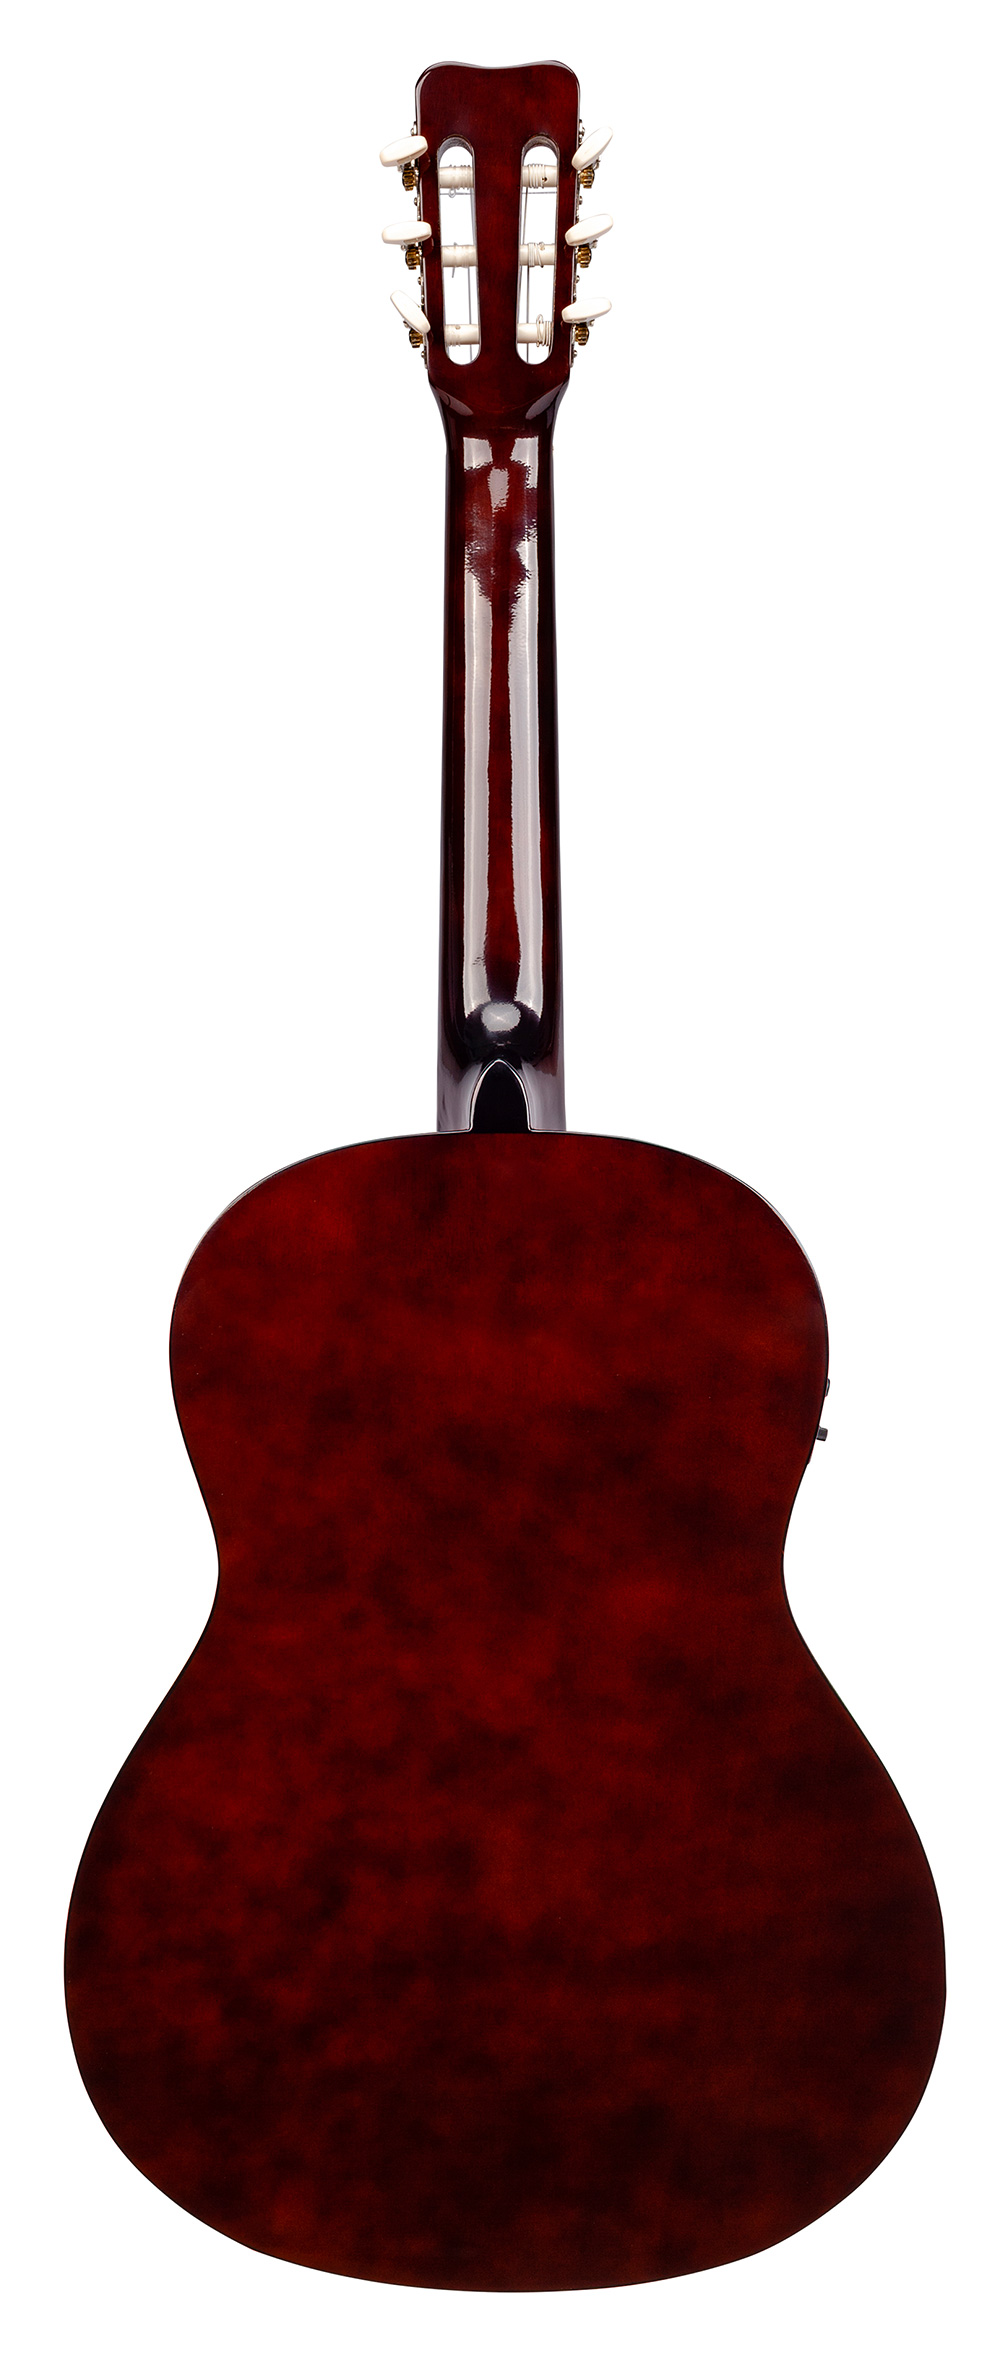 full size nylon string acoustic electric guitar w pickup onboard tuner and bag kohala ukuleles. Black Bedroom Furniture Sets. Home Design Ideas